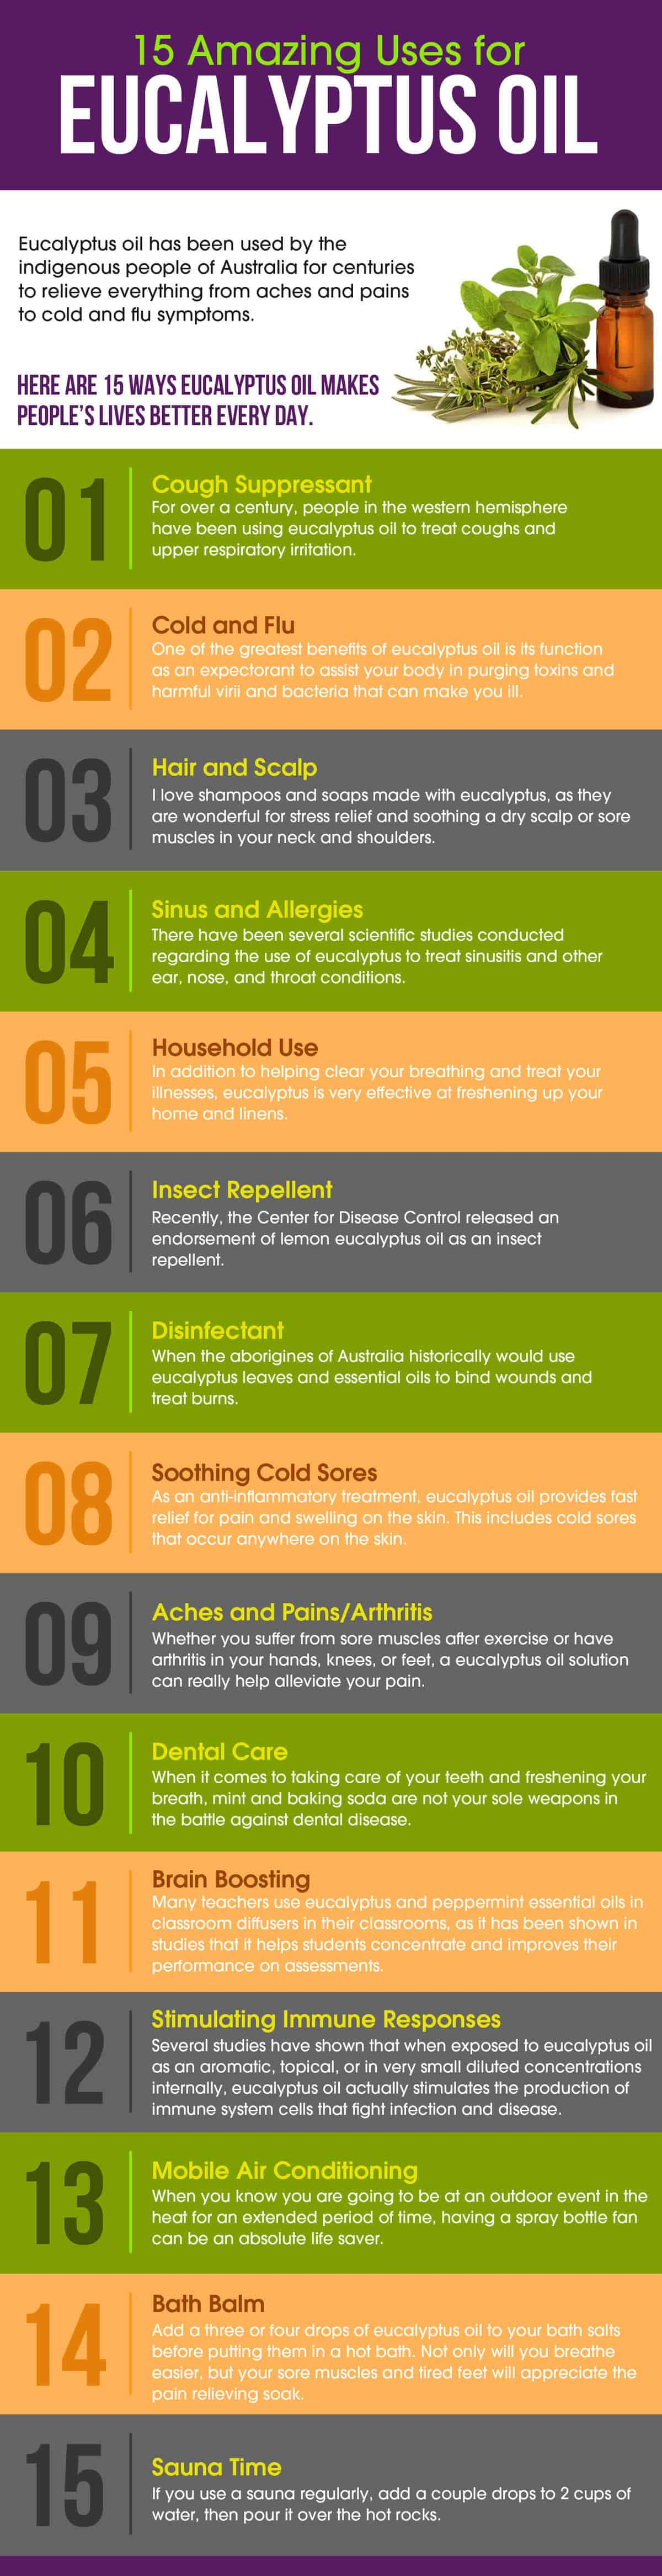 15 Amazing Uses for Eucalyptus Essential Oil